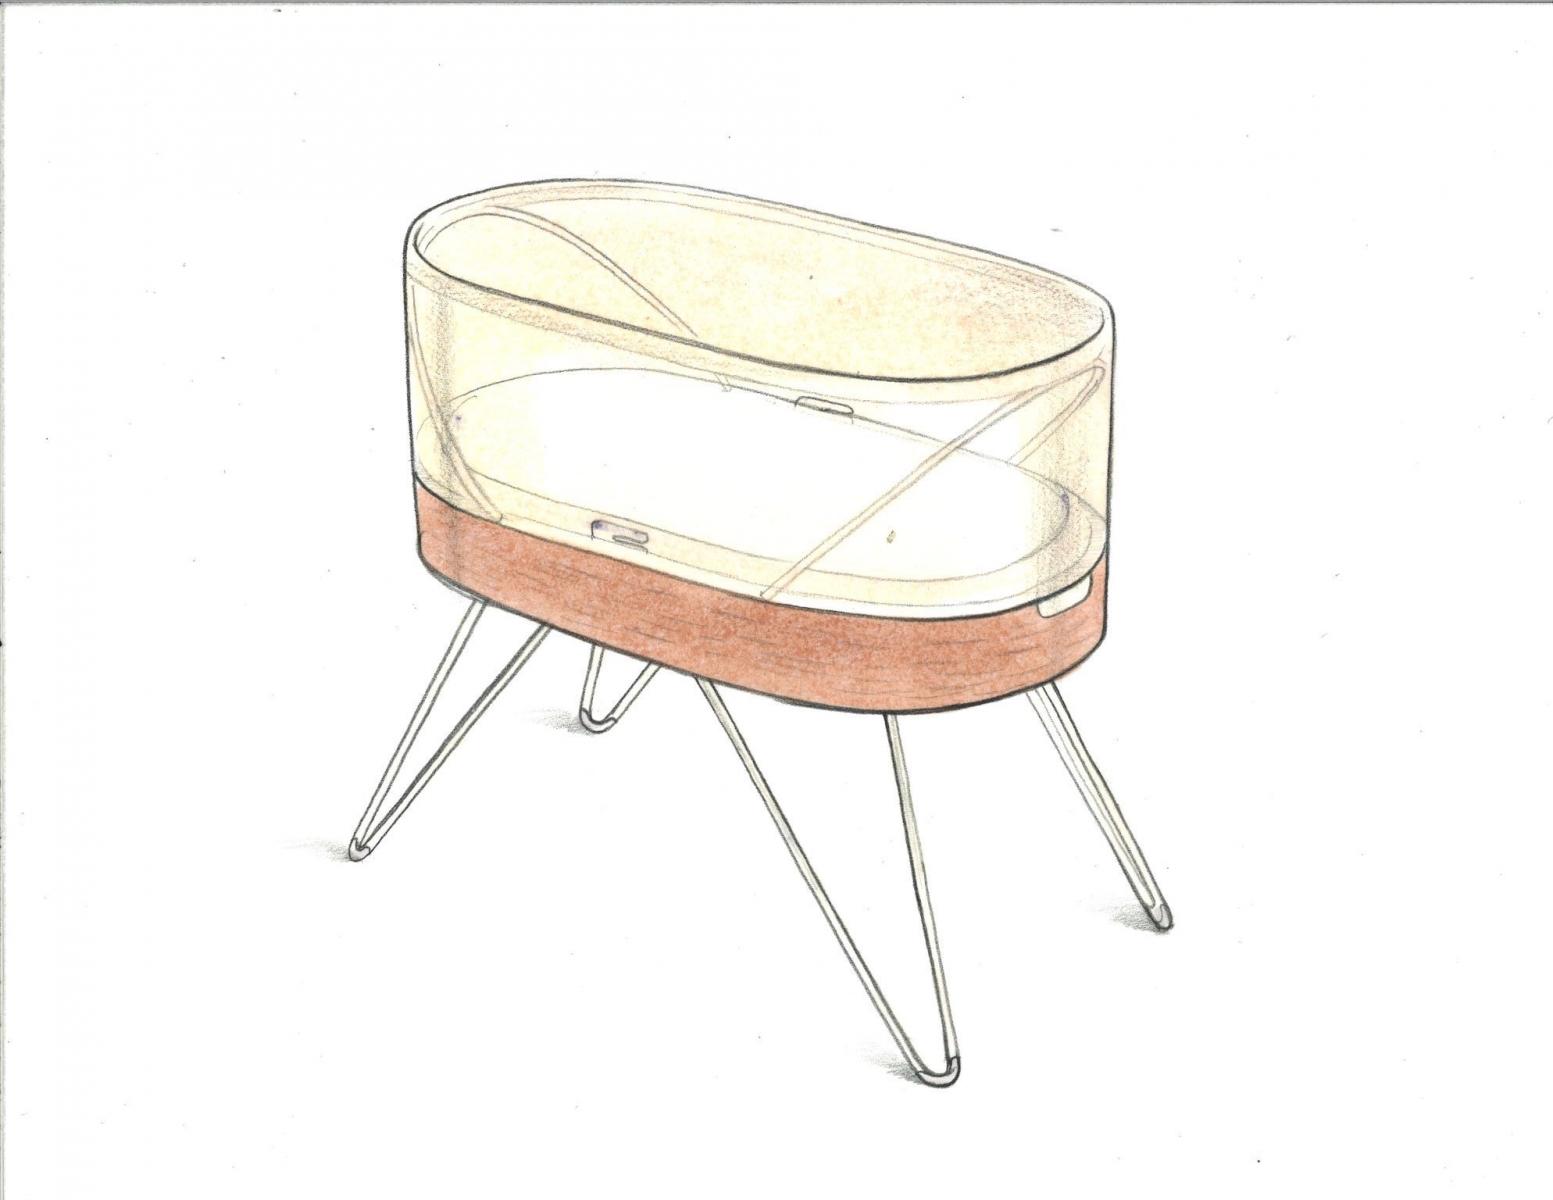 1553x1200 Yves Behar's Baby Crib Helps Infants Sleep Better